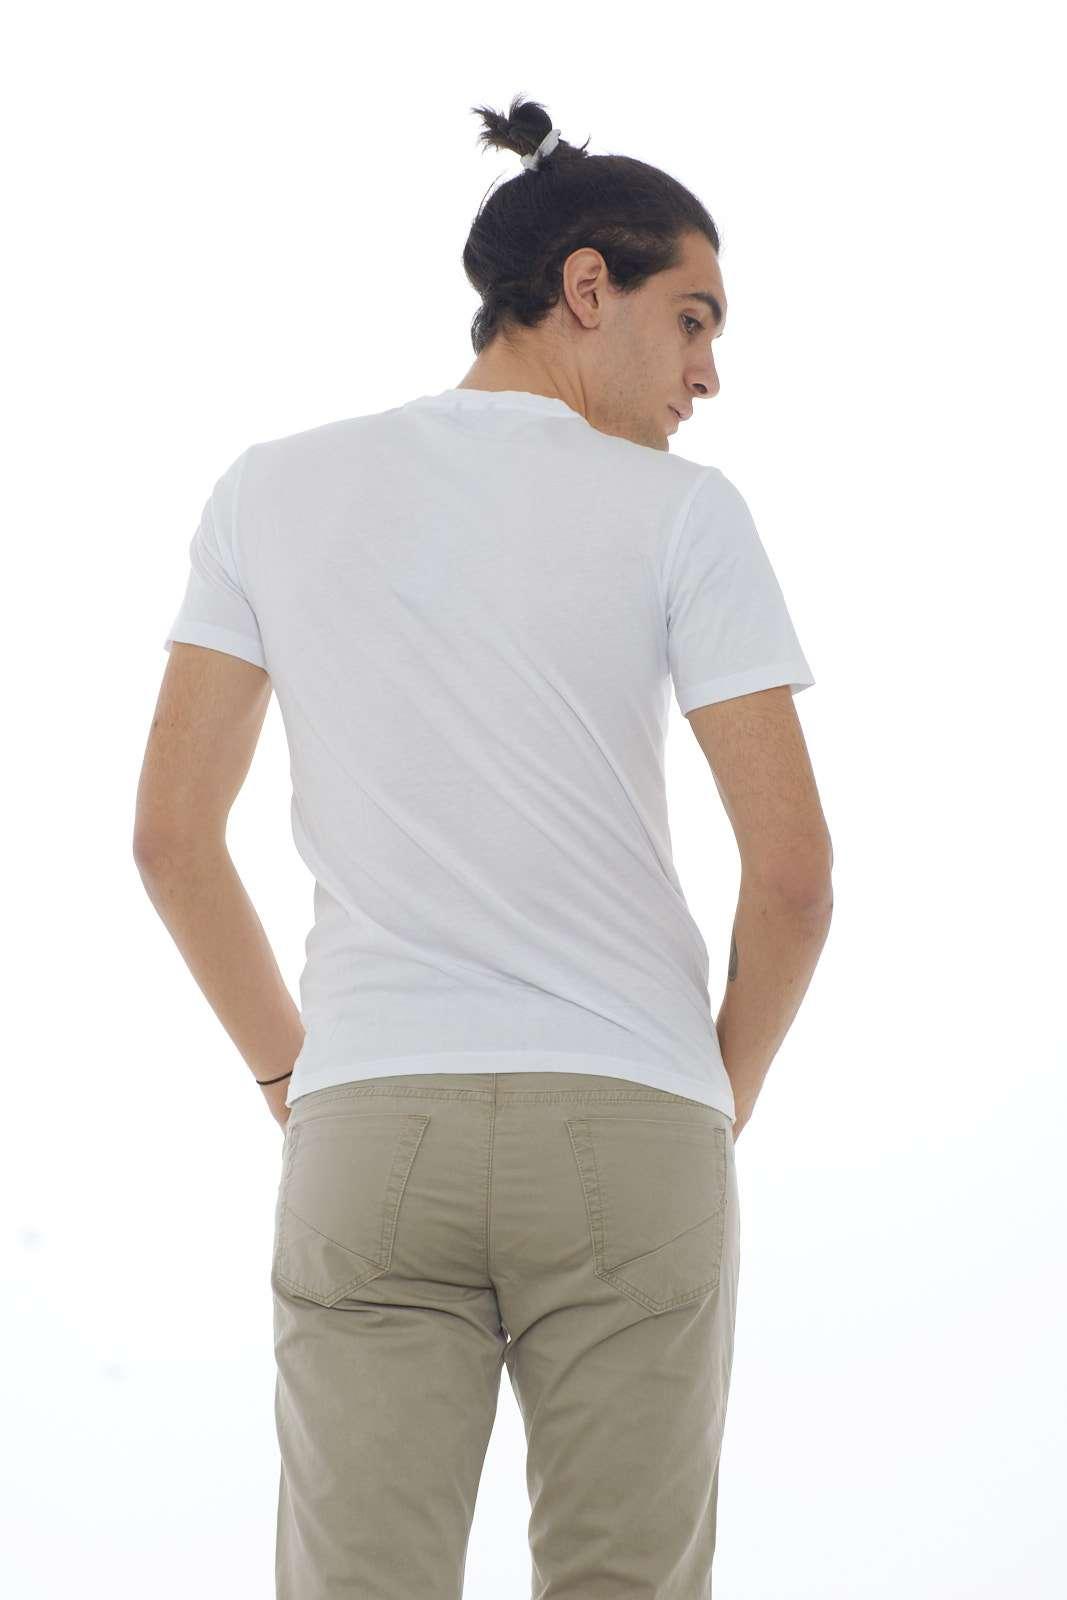 https://www.parmax.com/media/catalog/product/a/i/PE-outlet_parmax-t-shirt-uomo-Daniele-Alessandrini-M6870E6433900-C.jpg